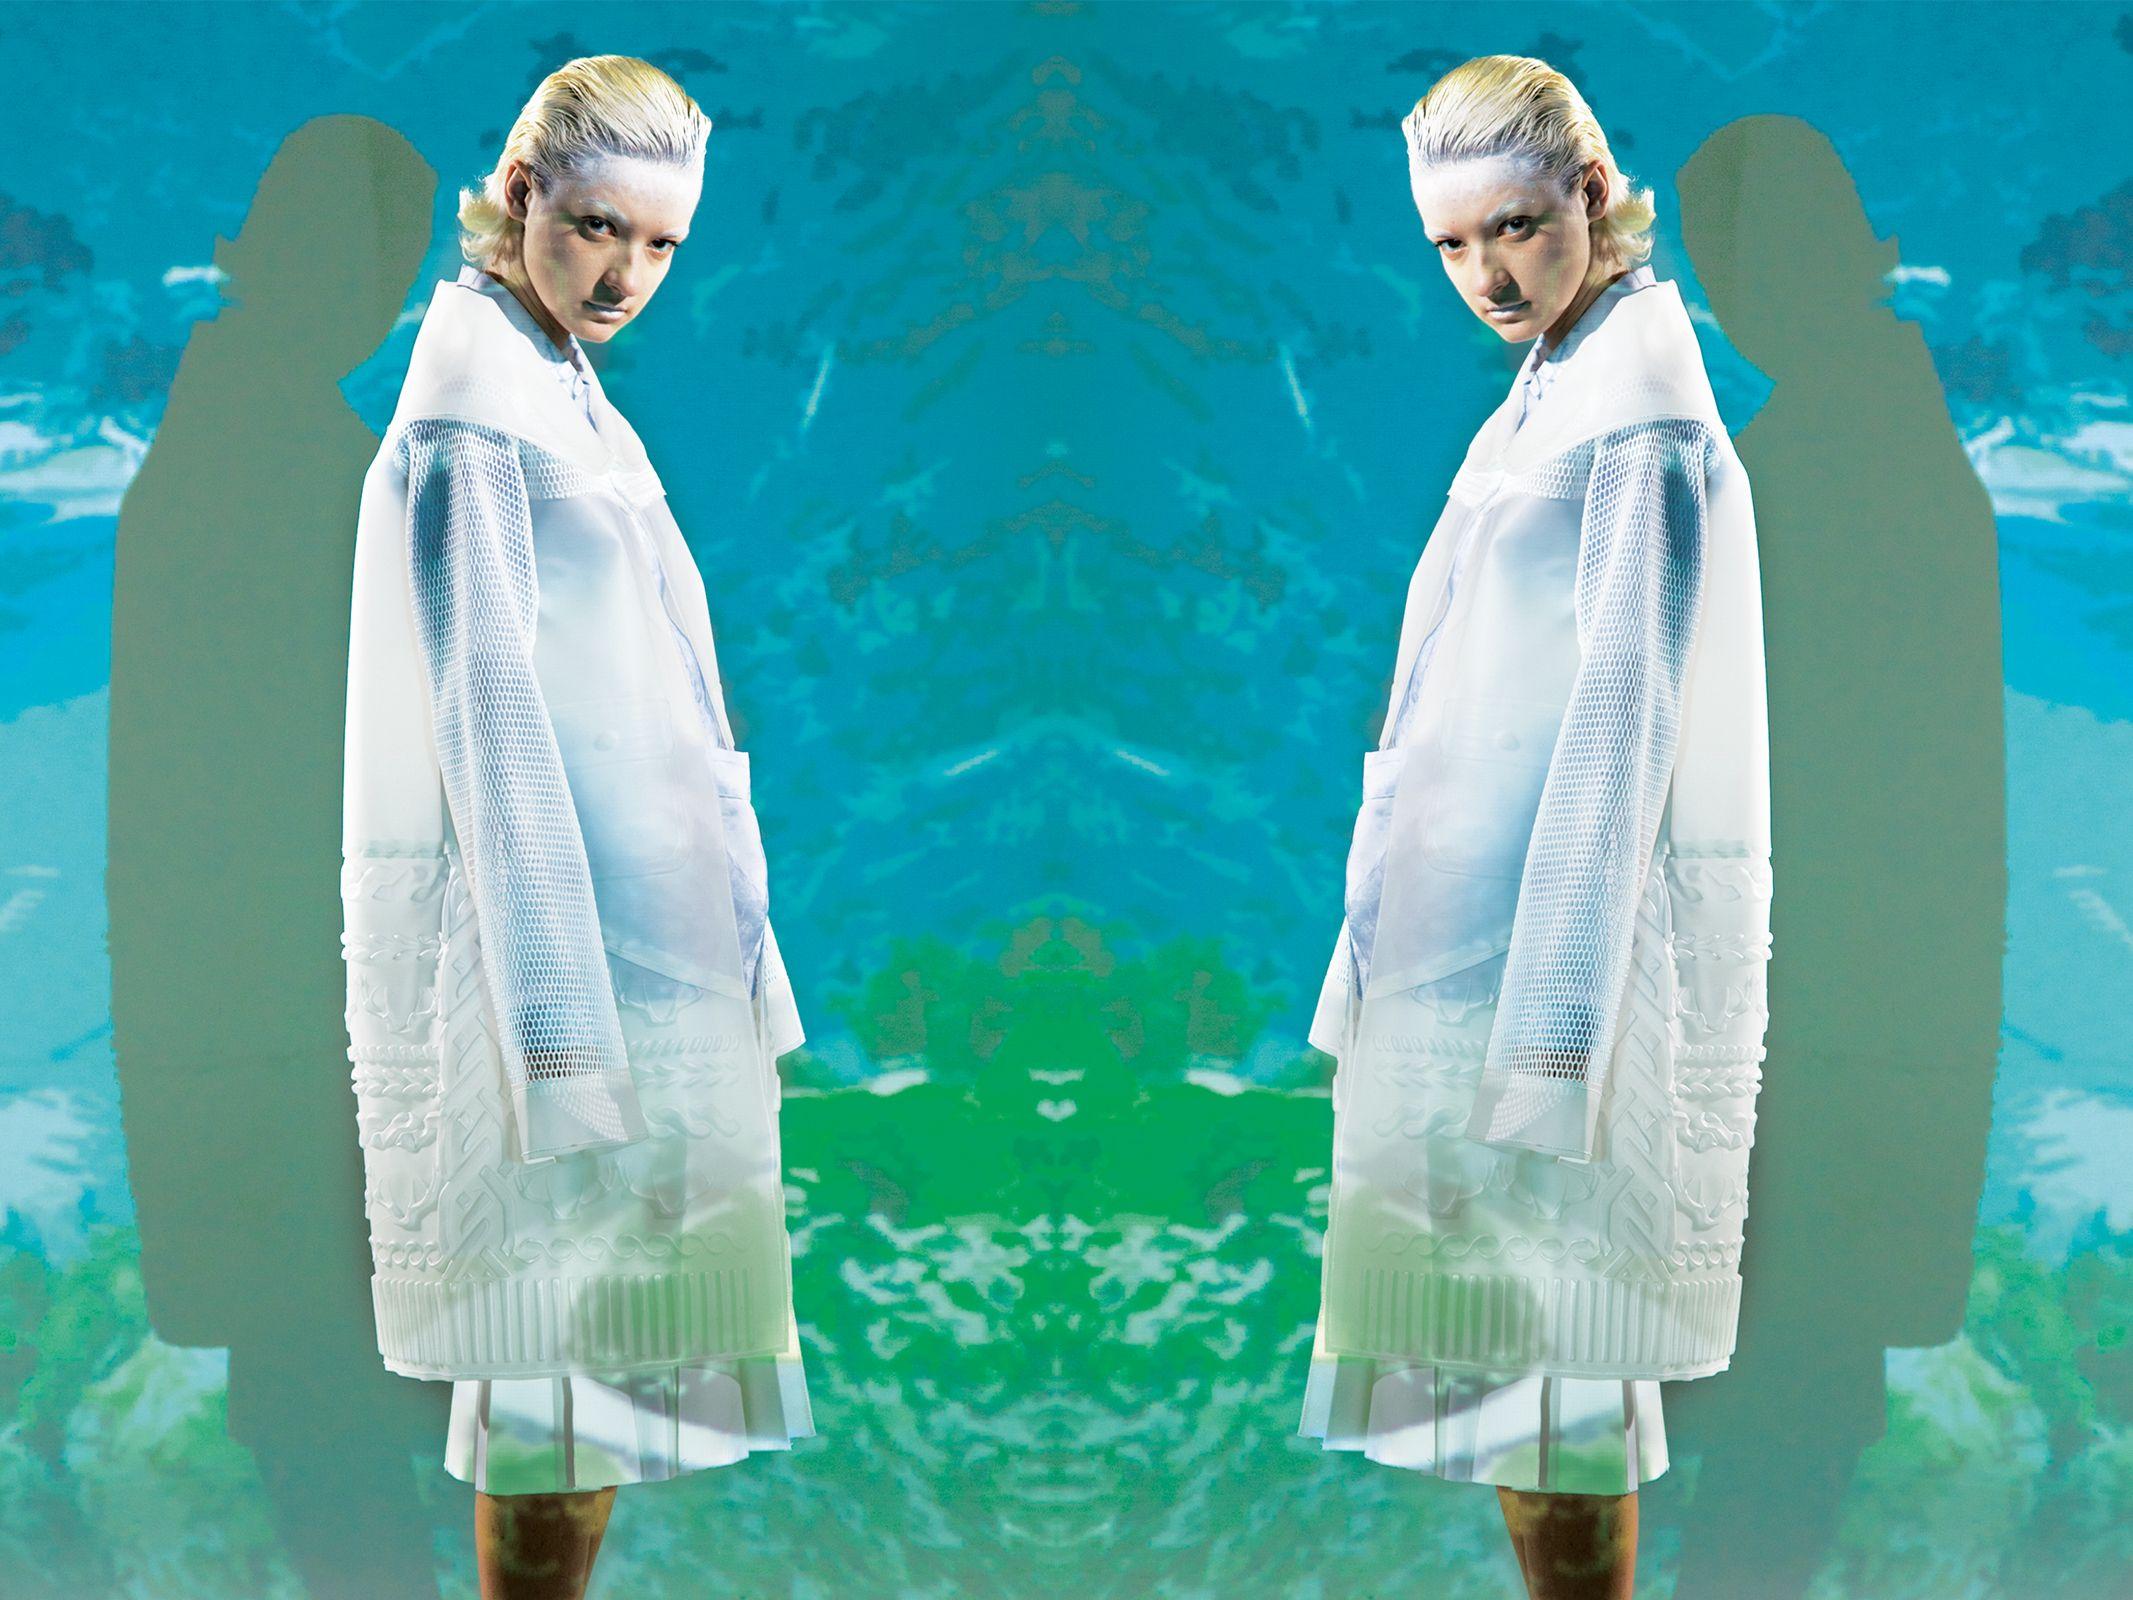 Cobe Yip Graduation Project Fashion Design